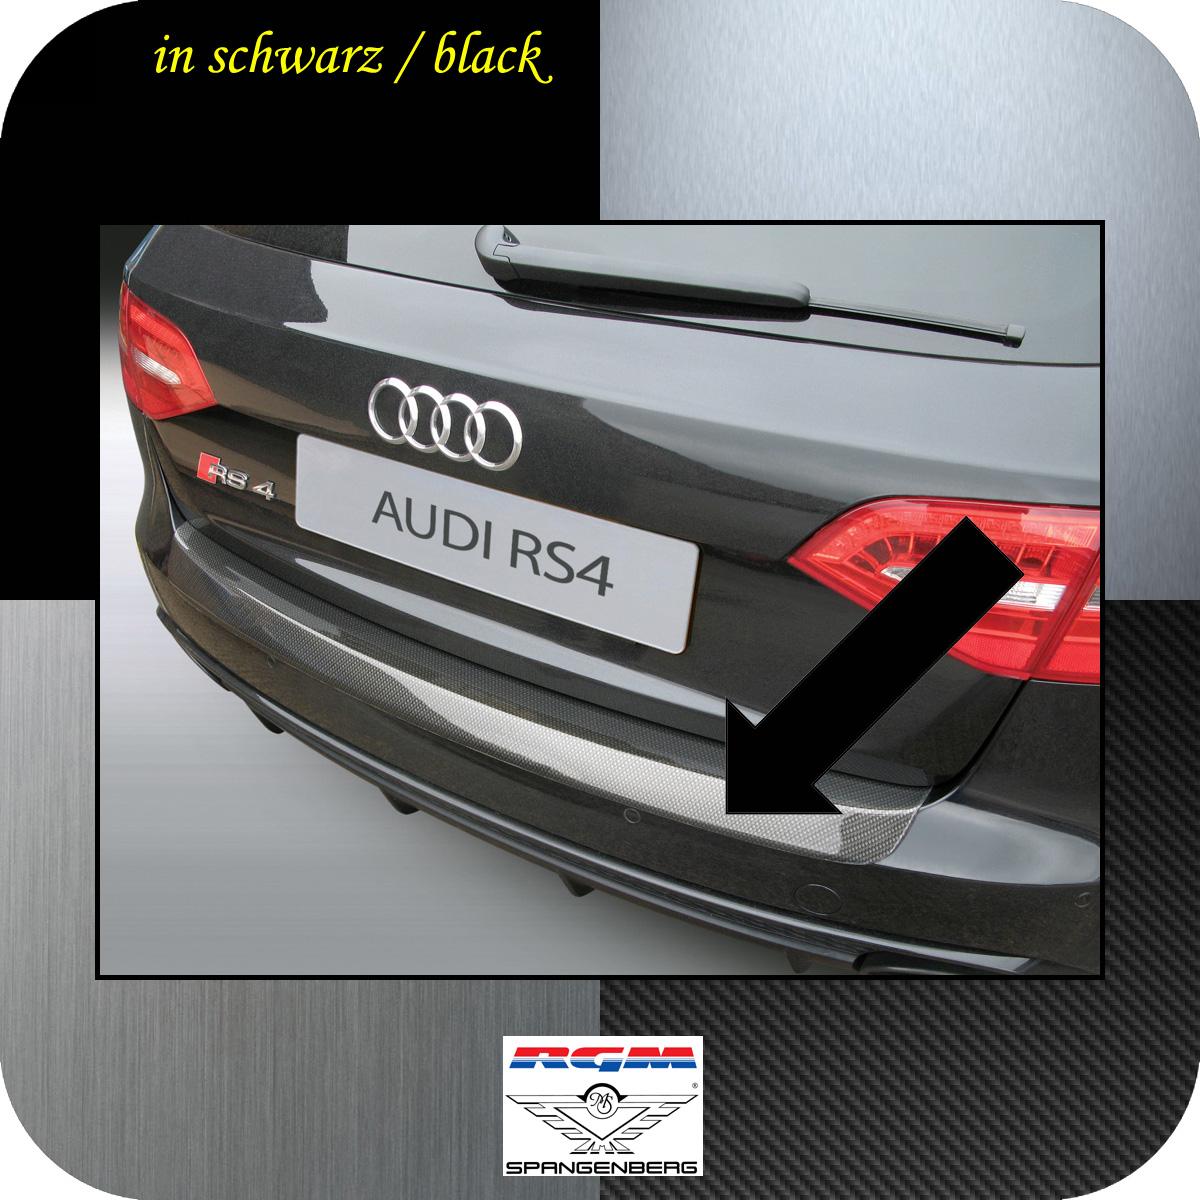 Ladekantenschutz schwarz Audi A4 Avant B8 nur RS4 Quattro 03.12-06.16 3500699